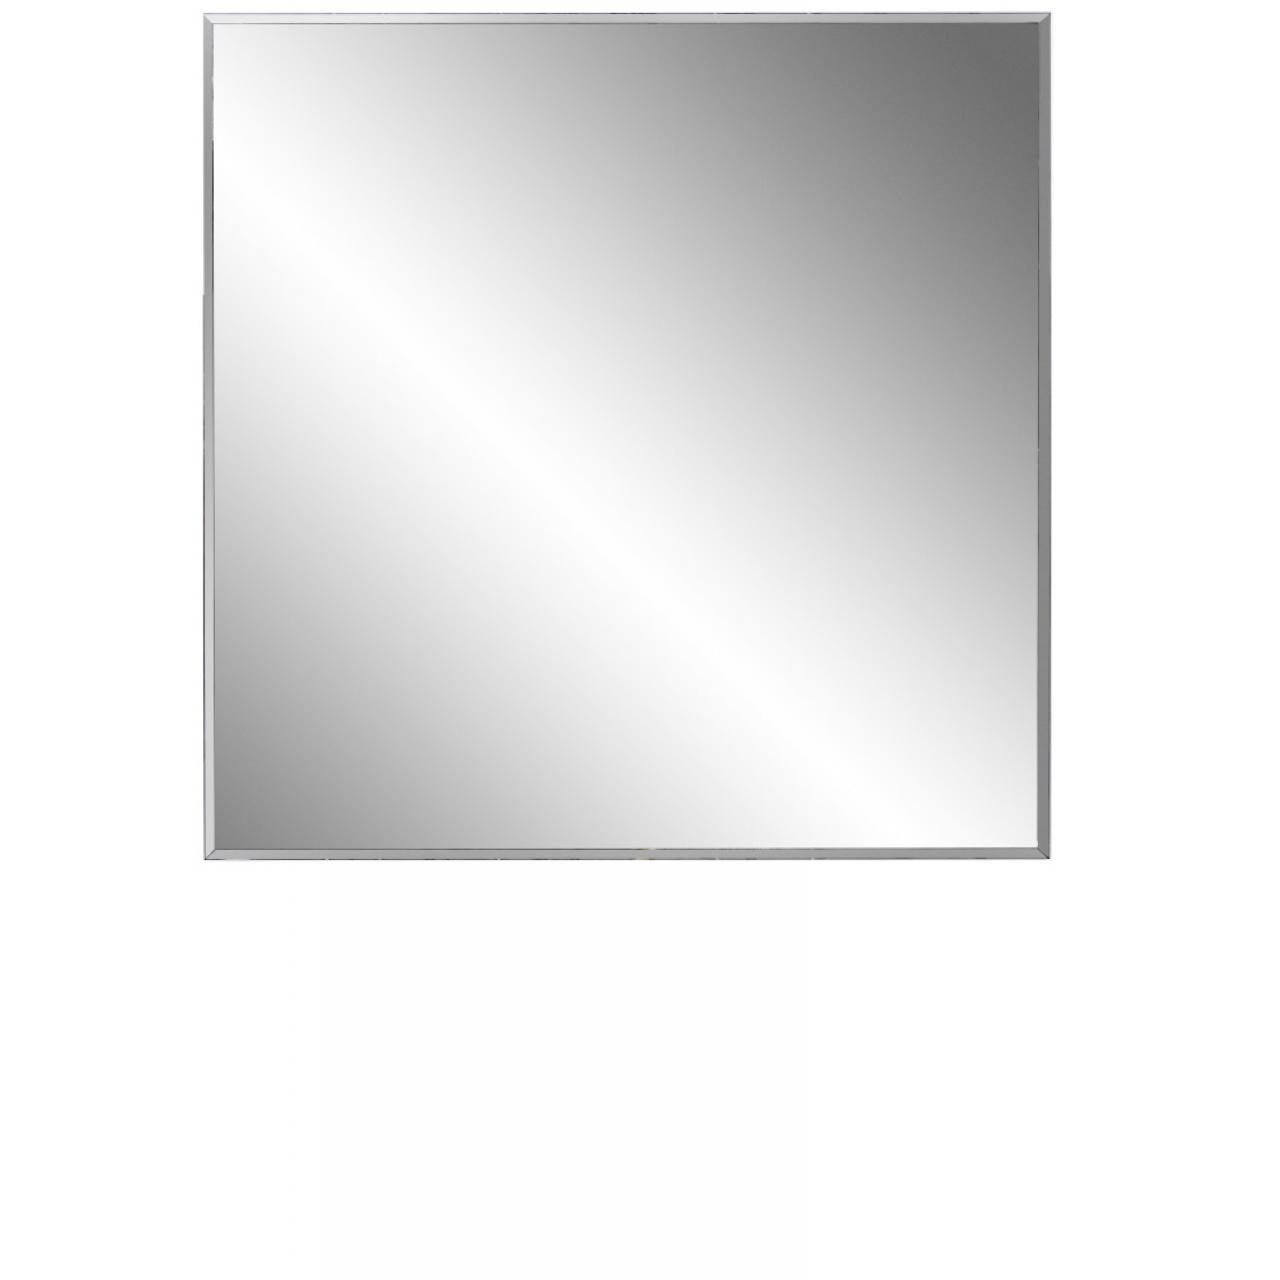 Spiegel K2 80x80 cm Garderobe Flur Diele